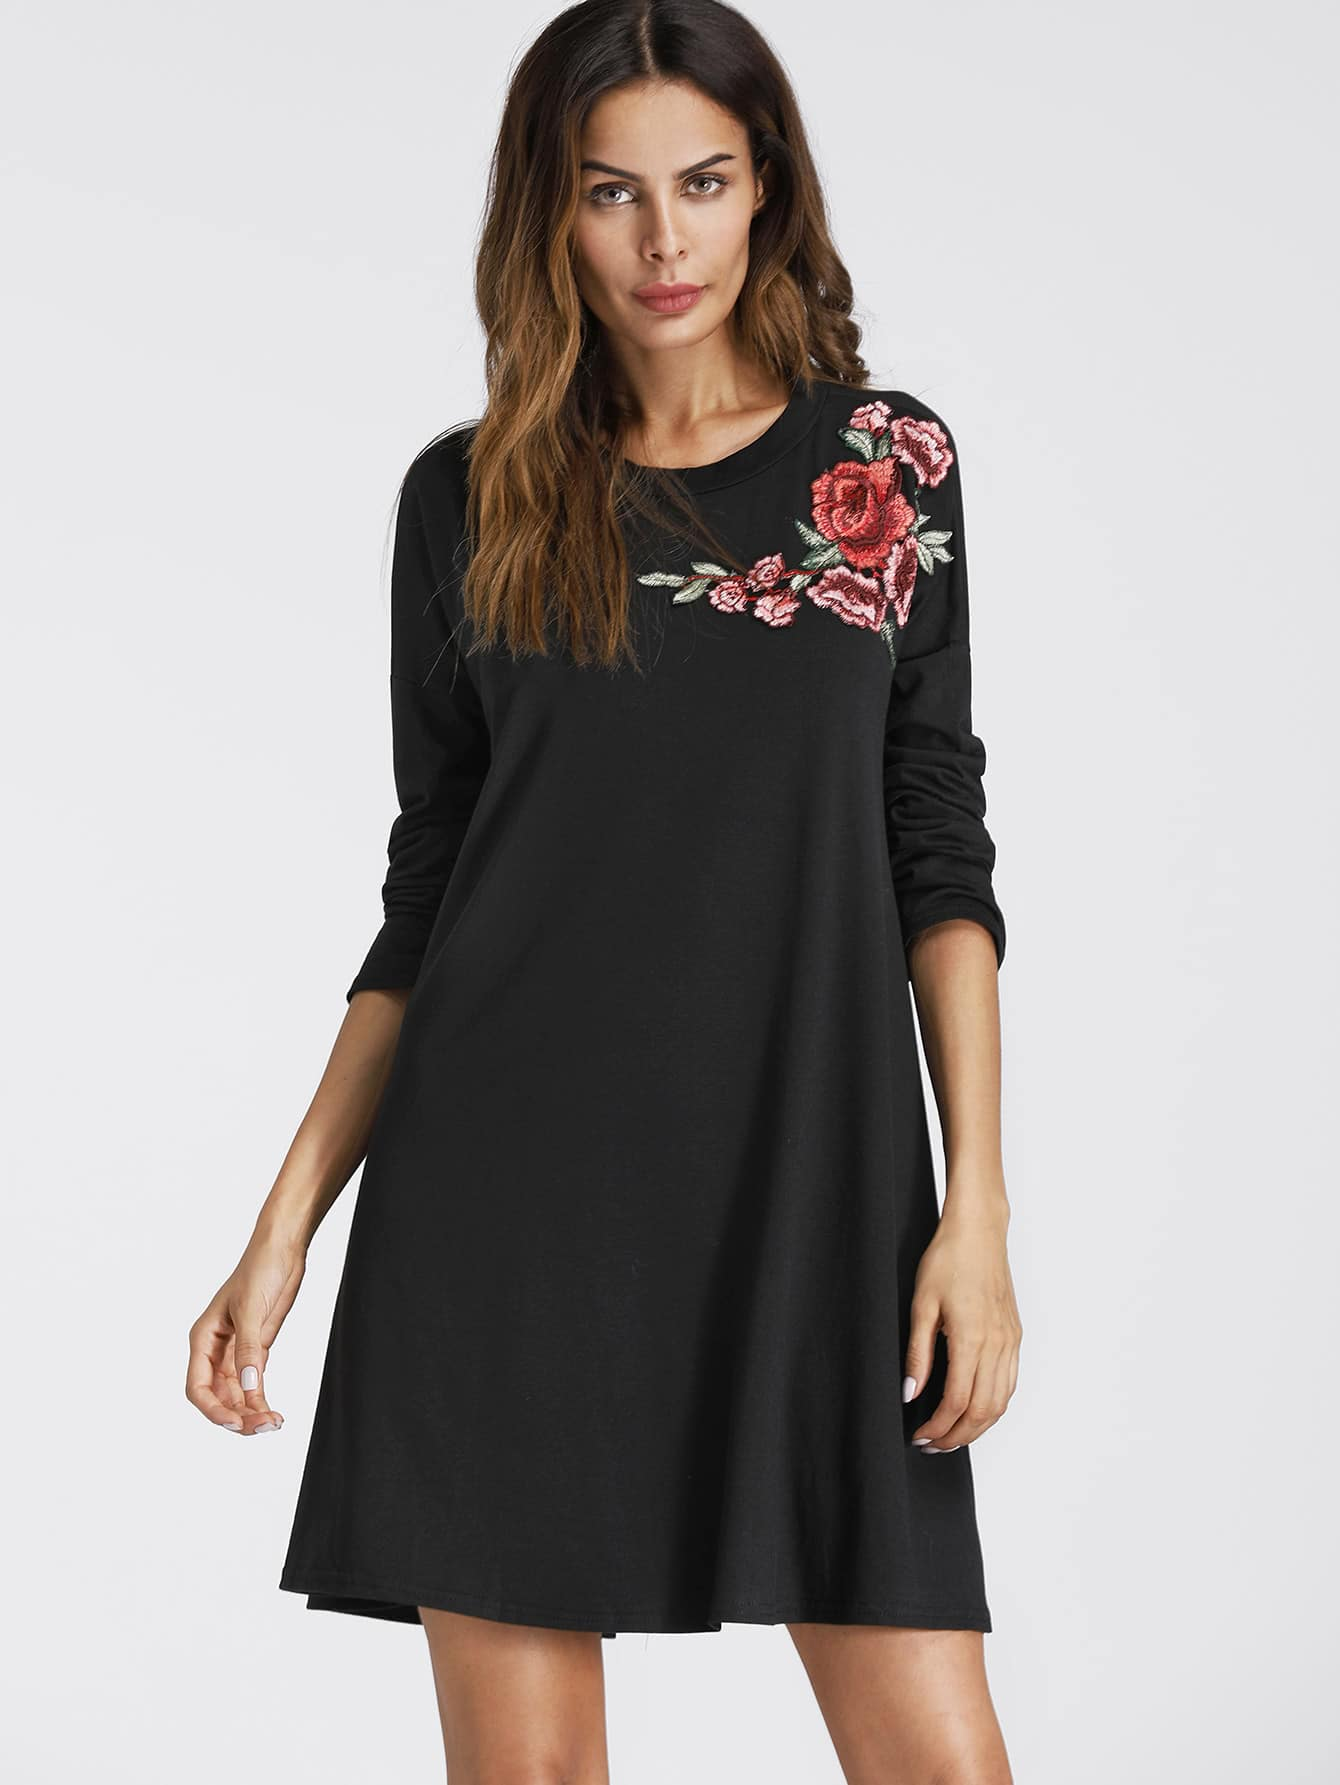 Embroidered Rose Applique Shift Dress rose embroidered applique sleeve sweatshirt